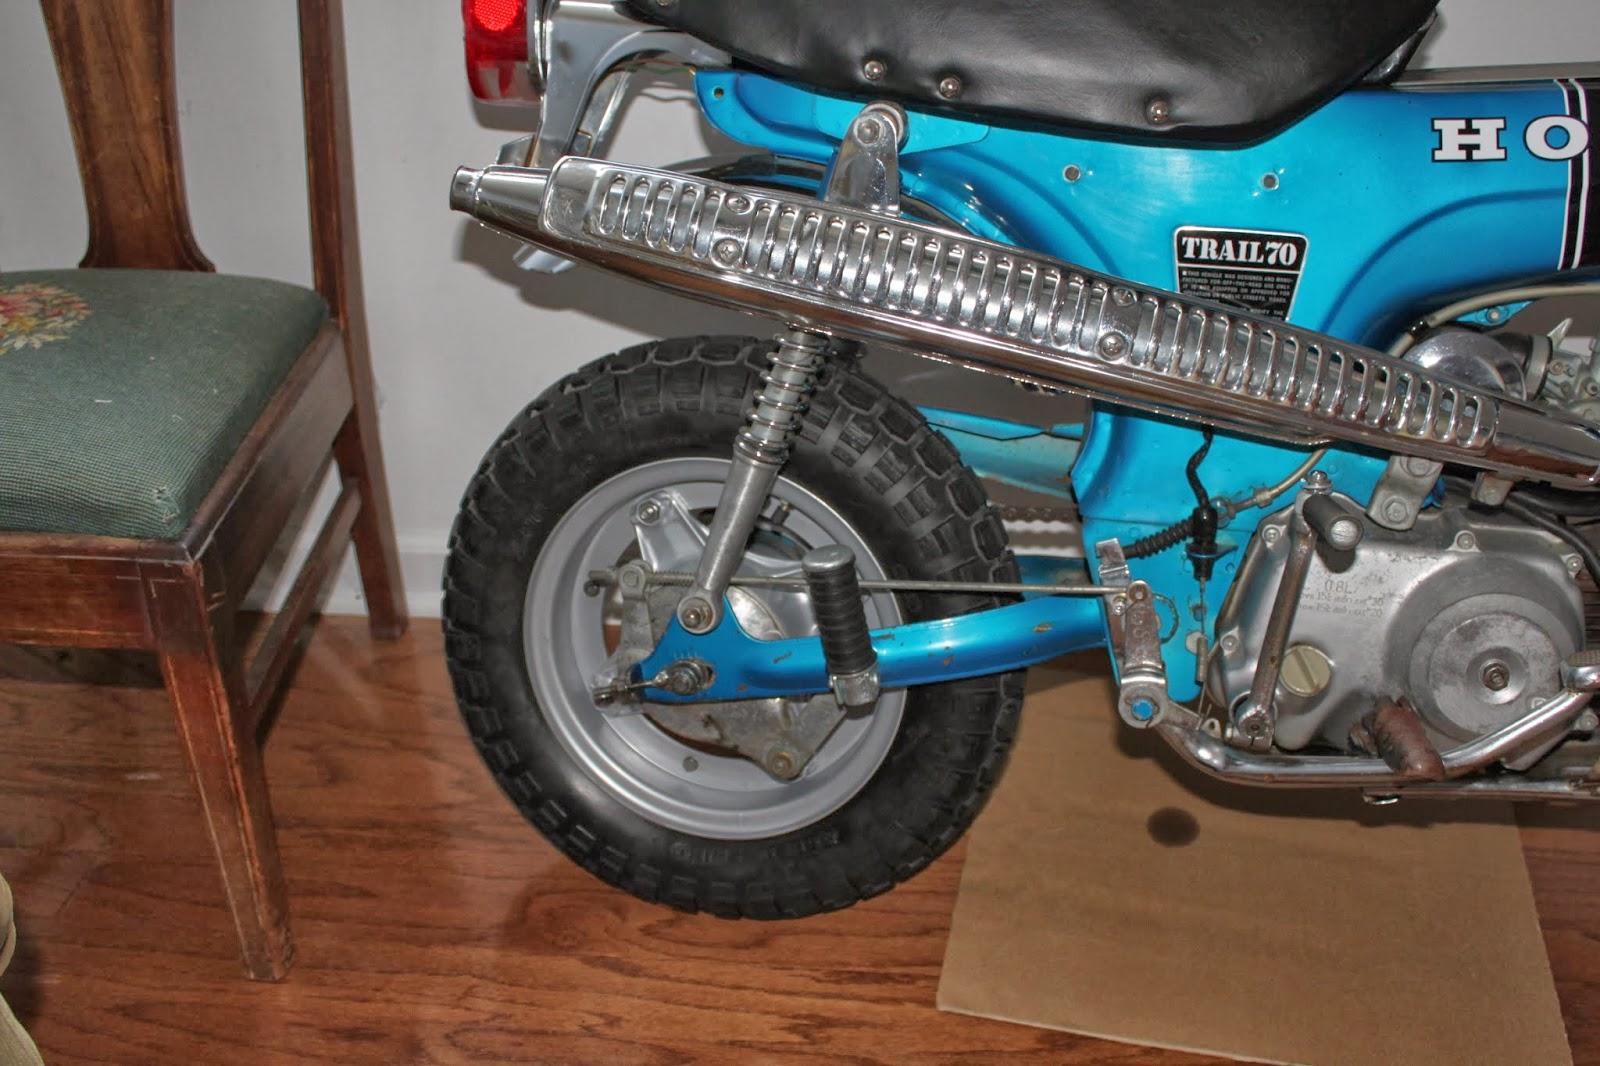 1970 Honda Ct70 Trail Bike 2000 Ann Arbor Grooshs Garage Engine